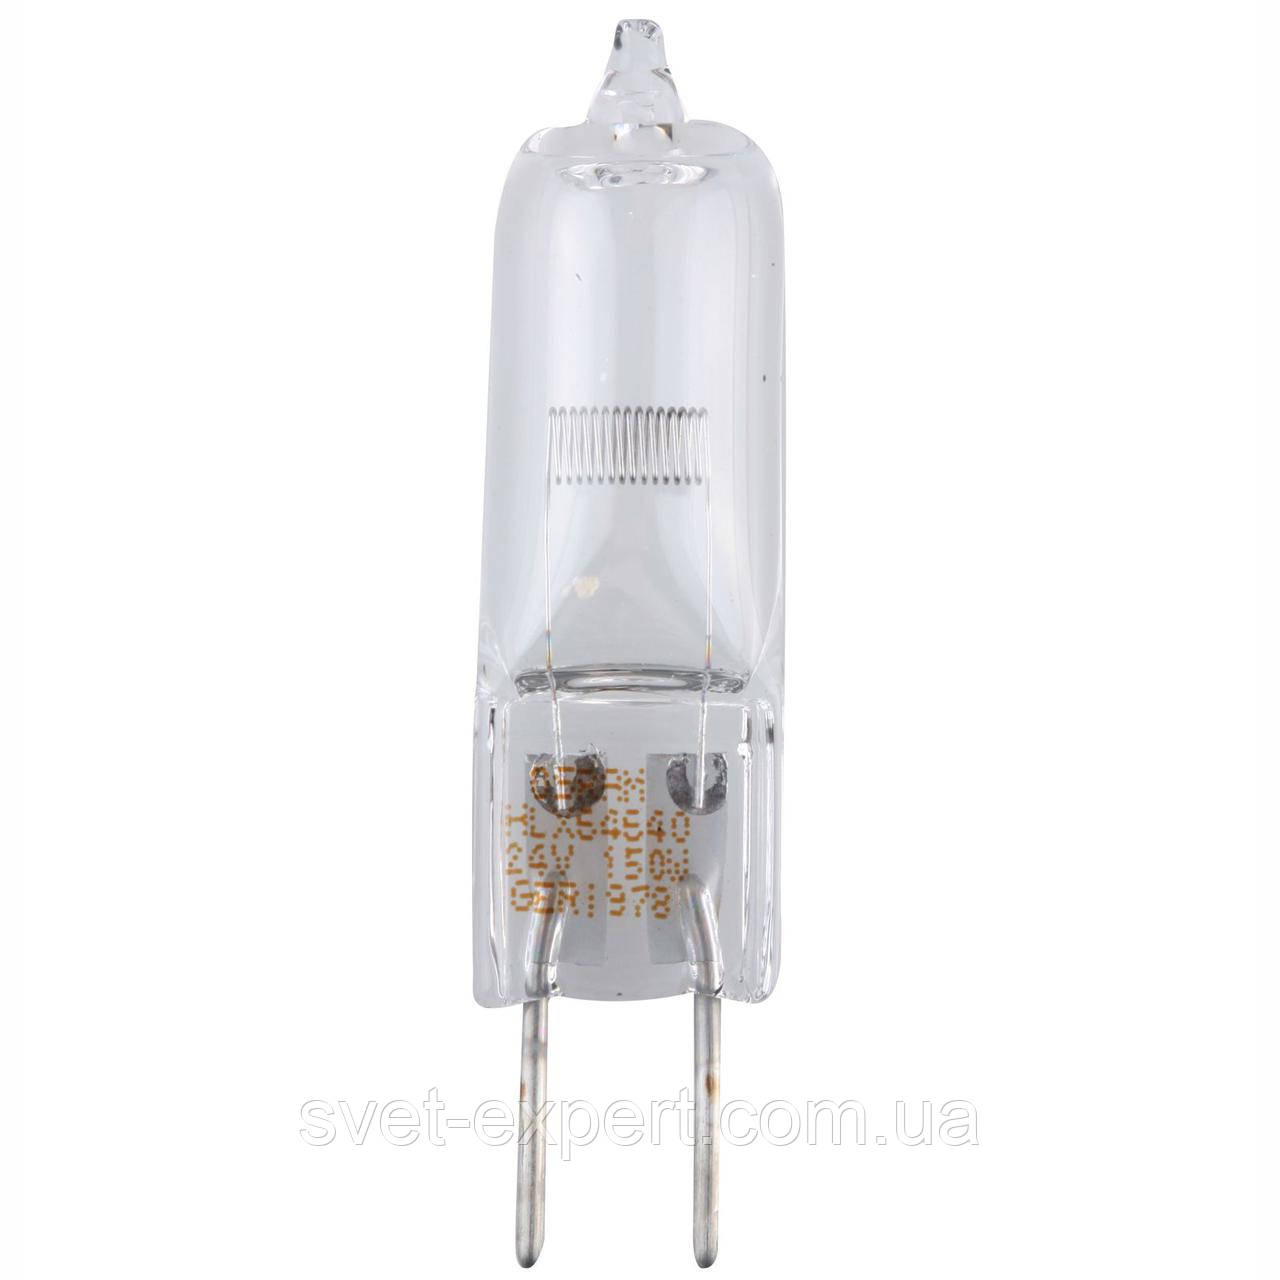 Лампа 64640 HLX 150W 3550°К 50ч 24В G6.35 FCS 40x1 OSRAM